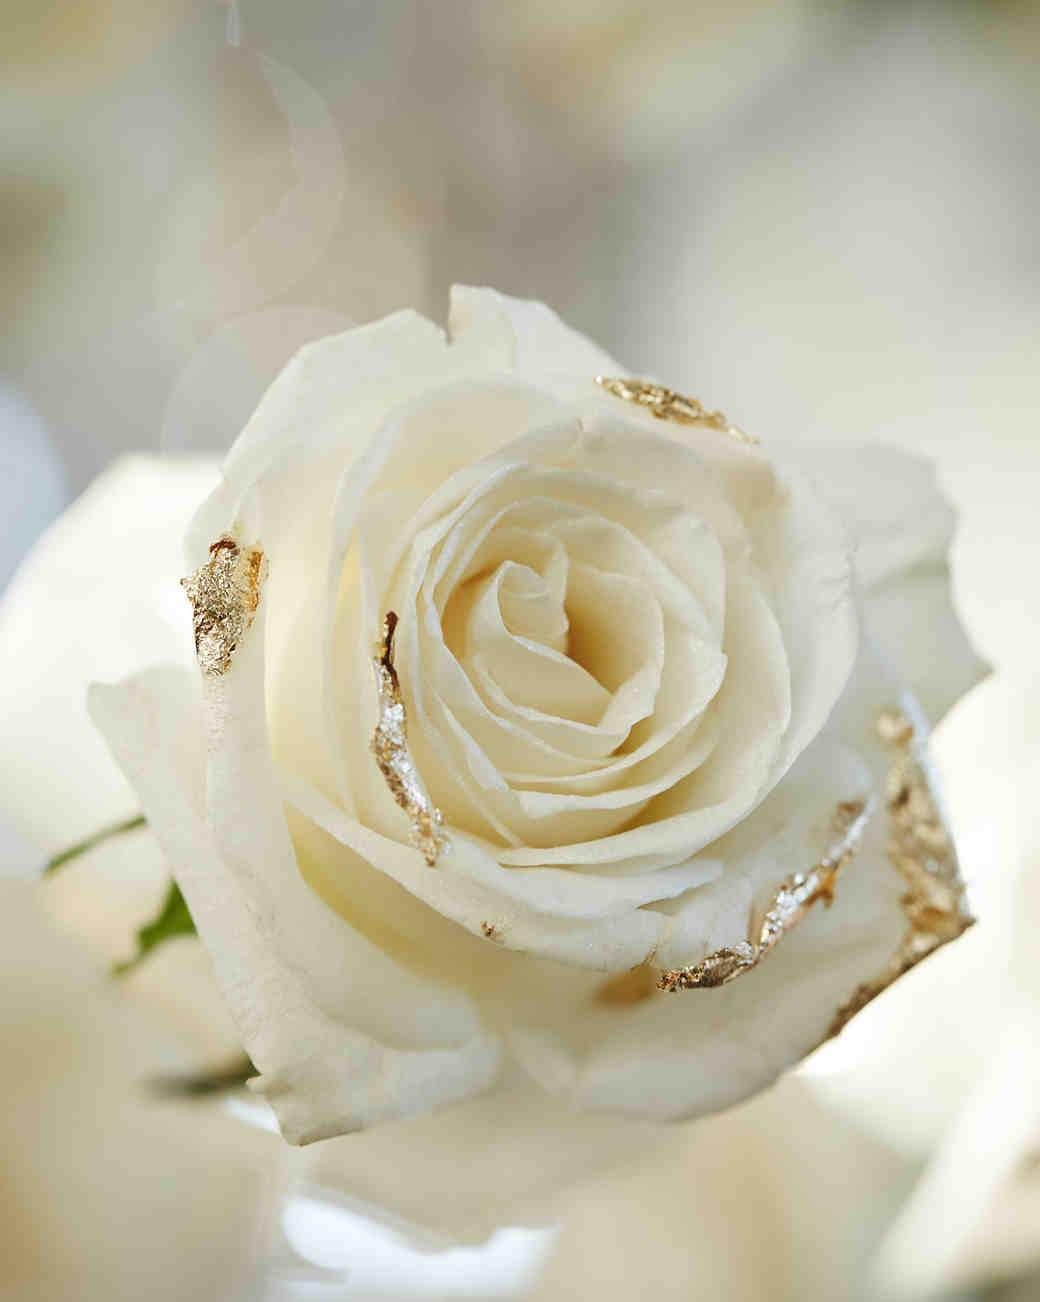 martha-weddings-party-2015-christian-oth-rose-151012-0164-1015.jpg